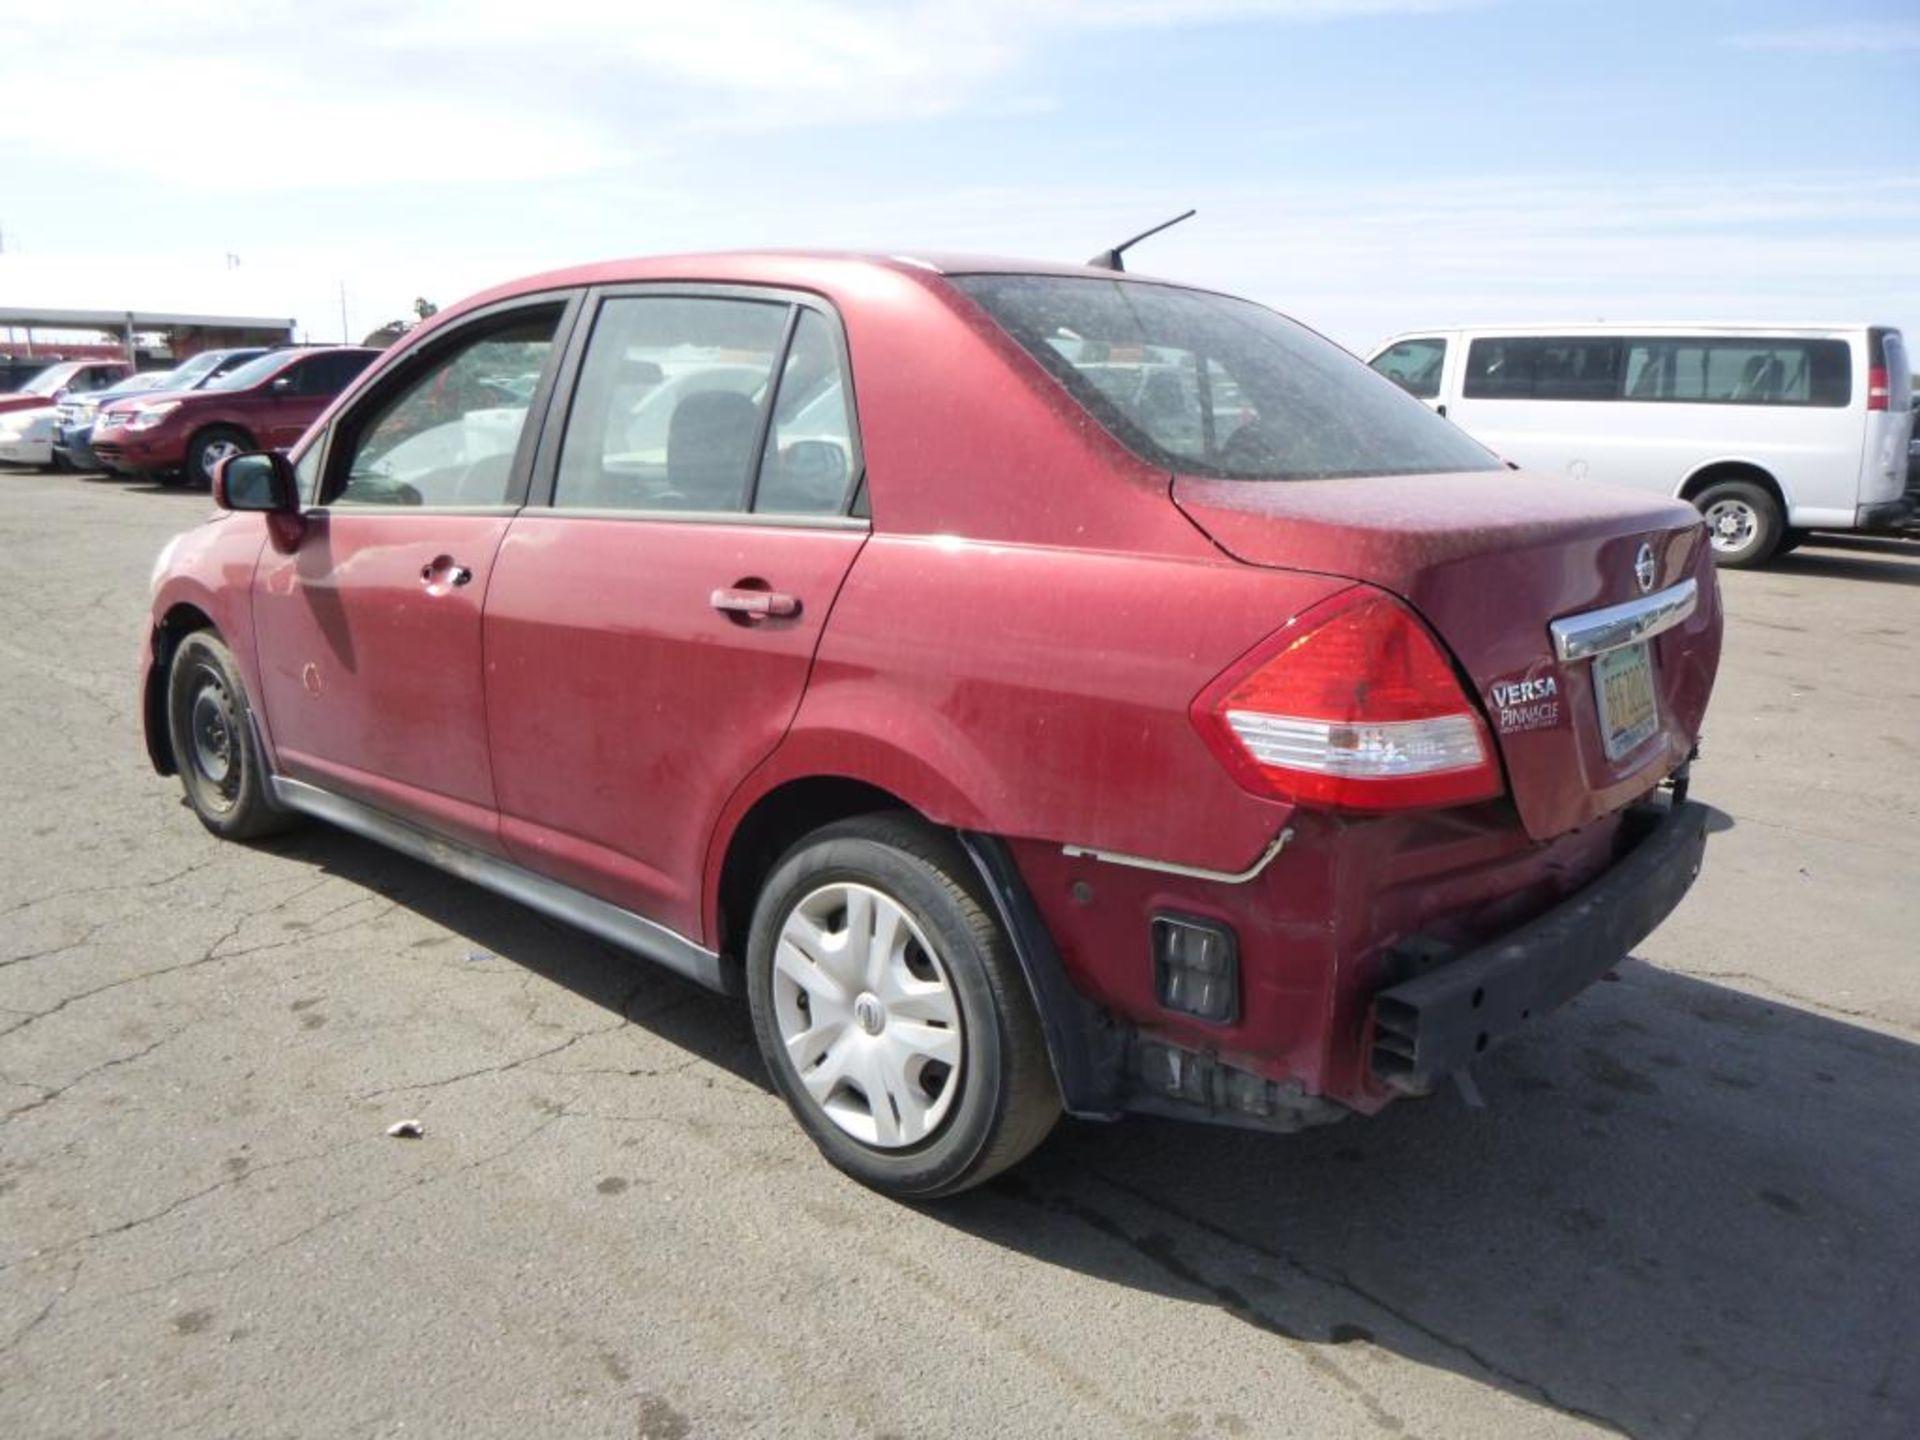 2010 Nissan Versa - Image 2 of 13